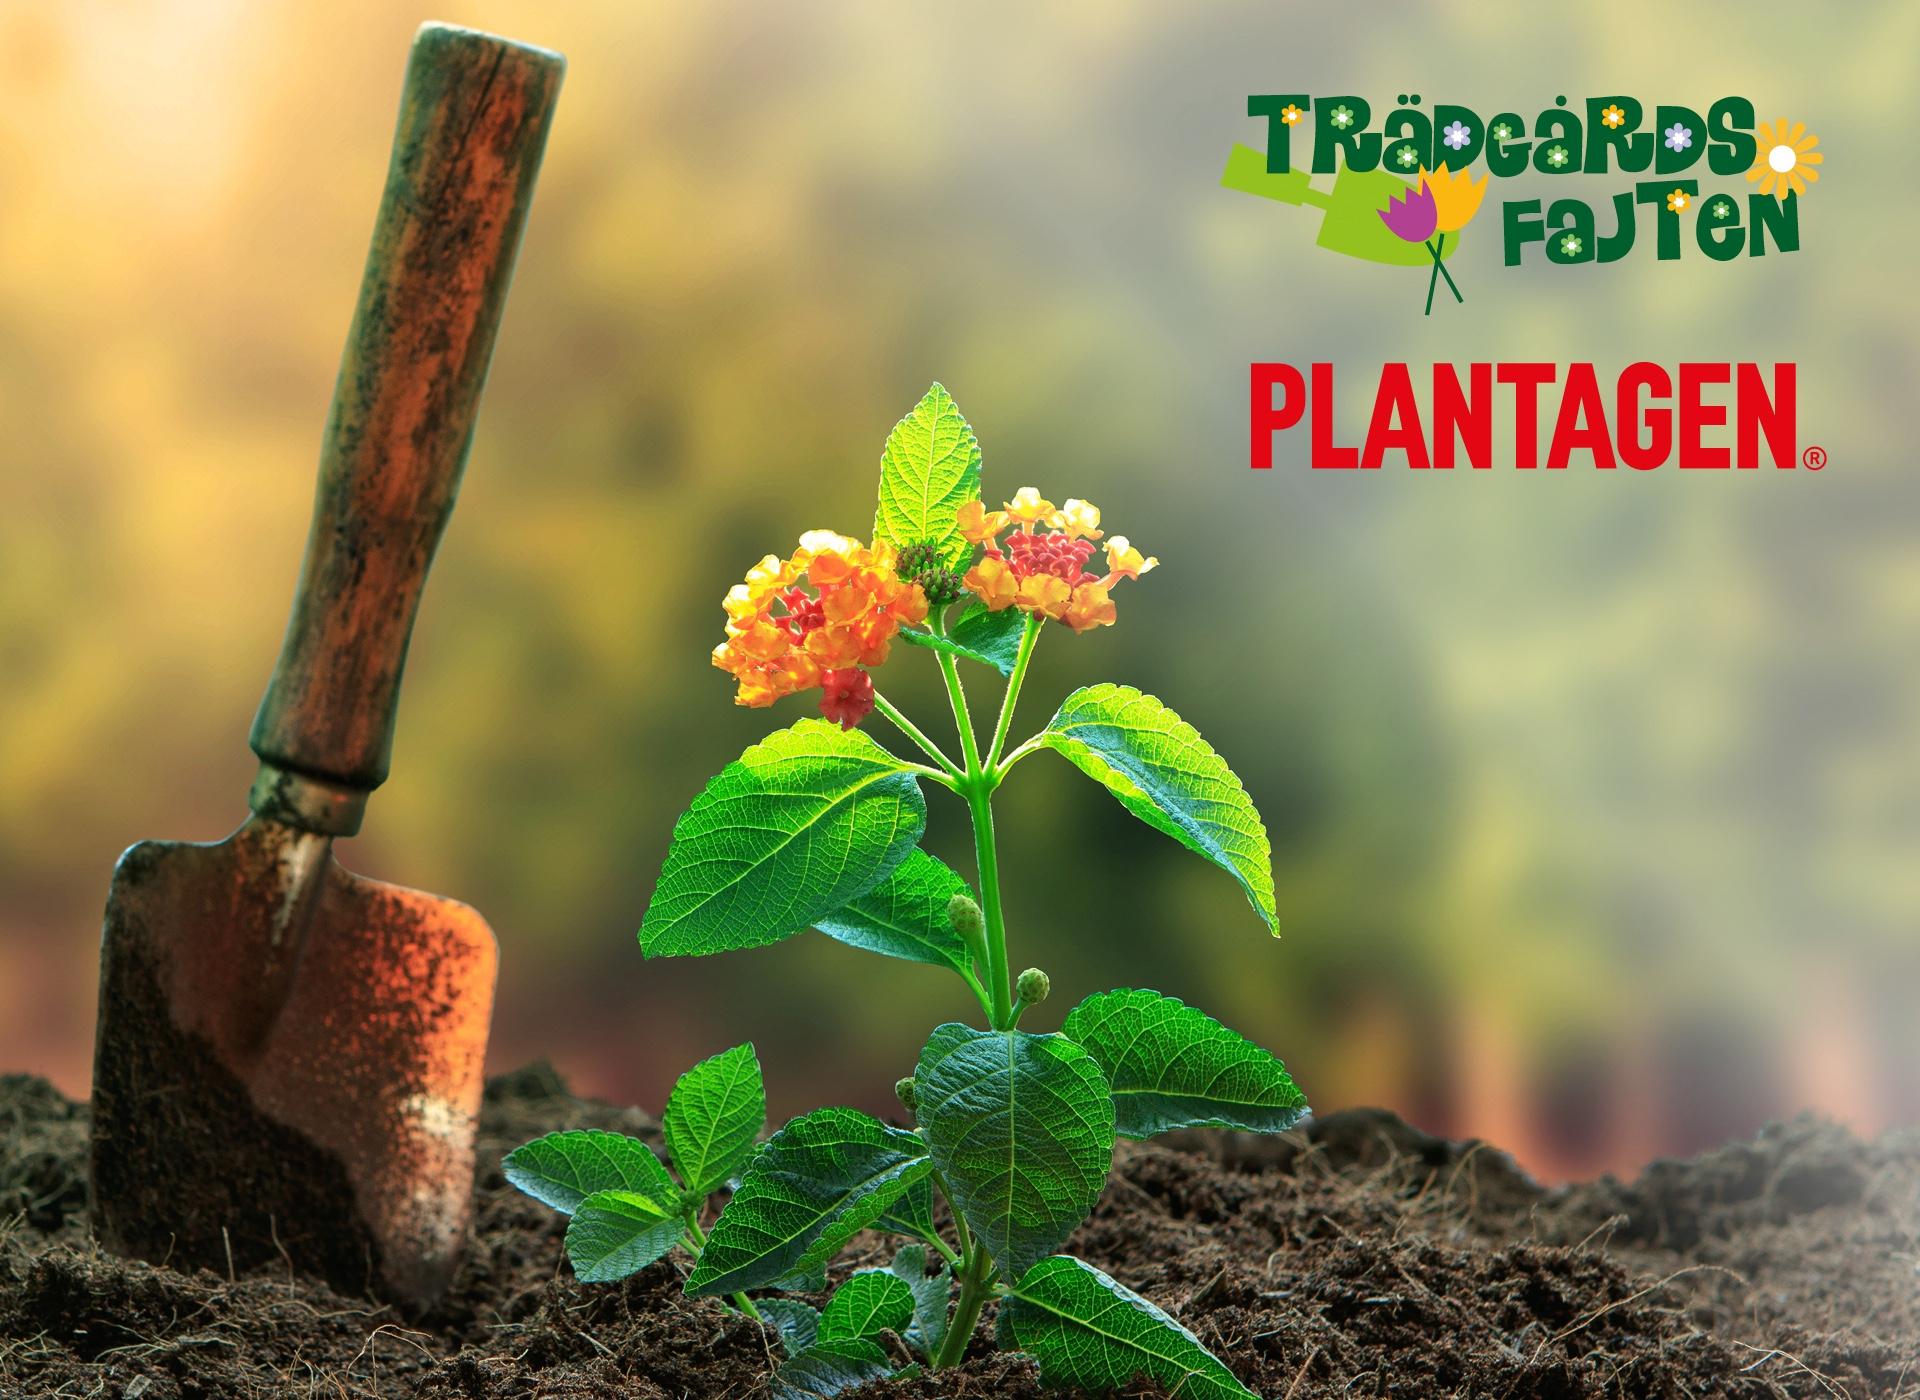 EUROFLORIST PRESENTKORT PLANTAGEN